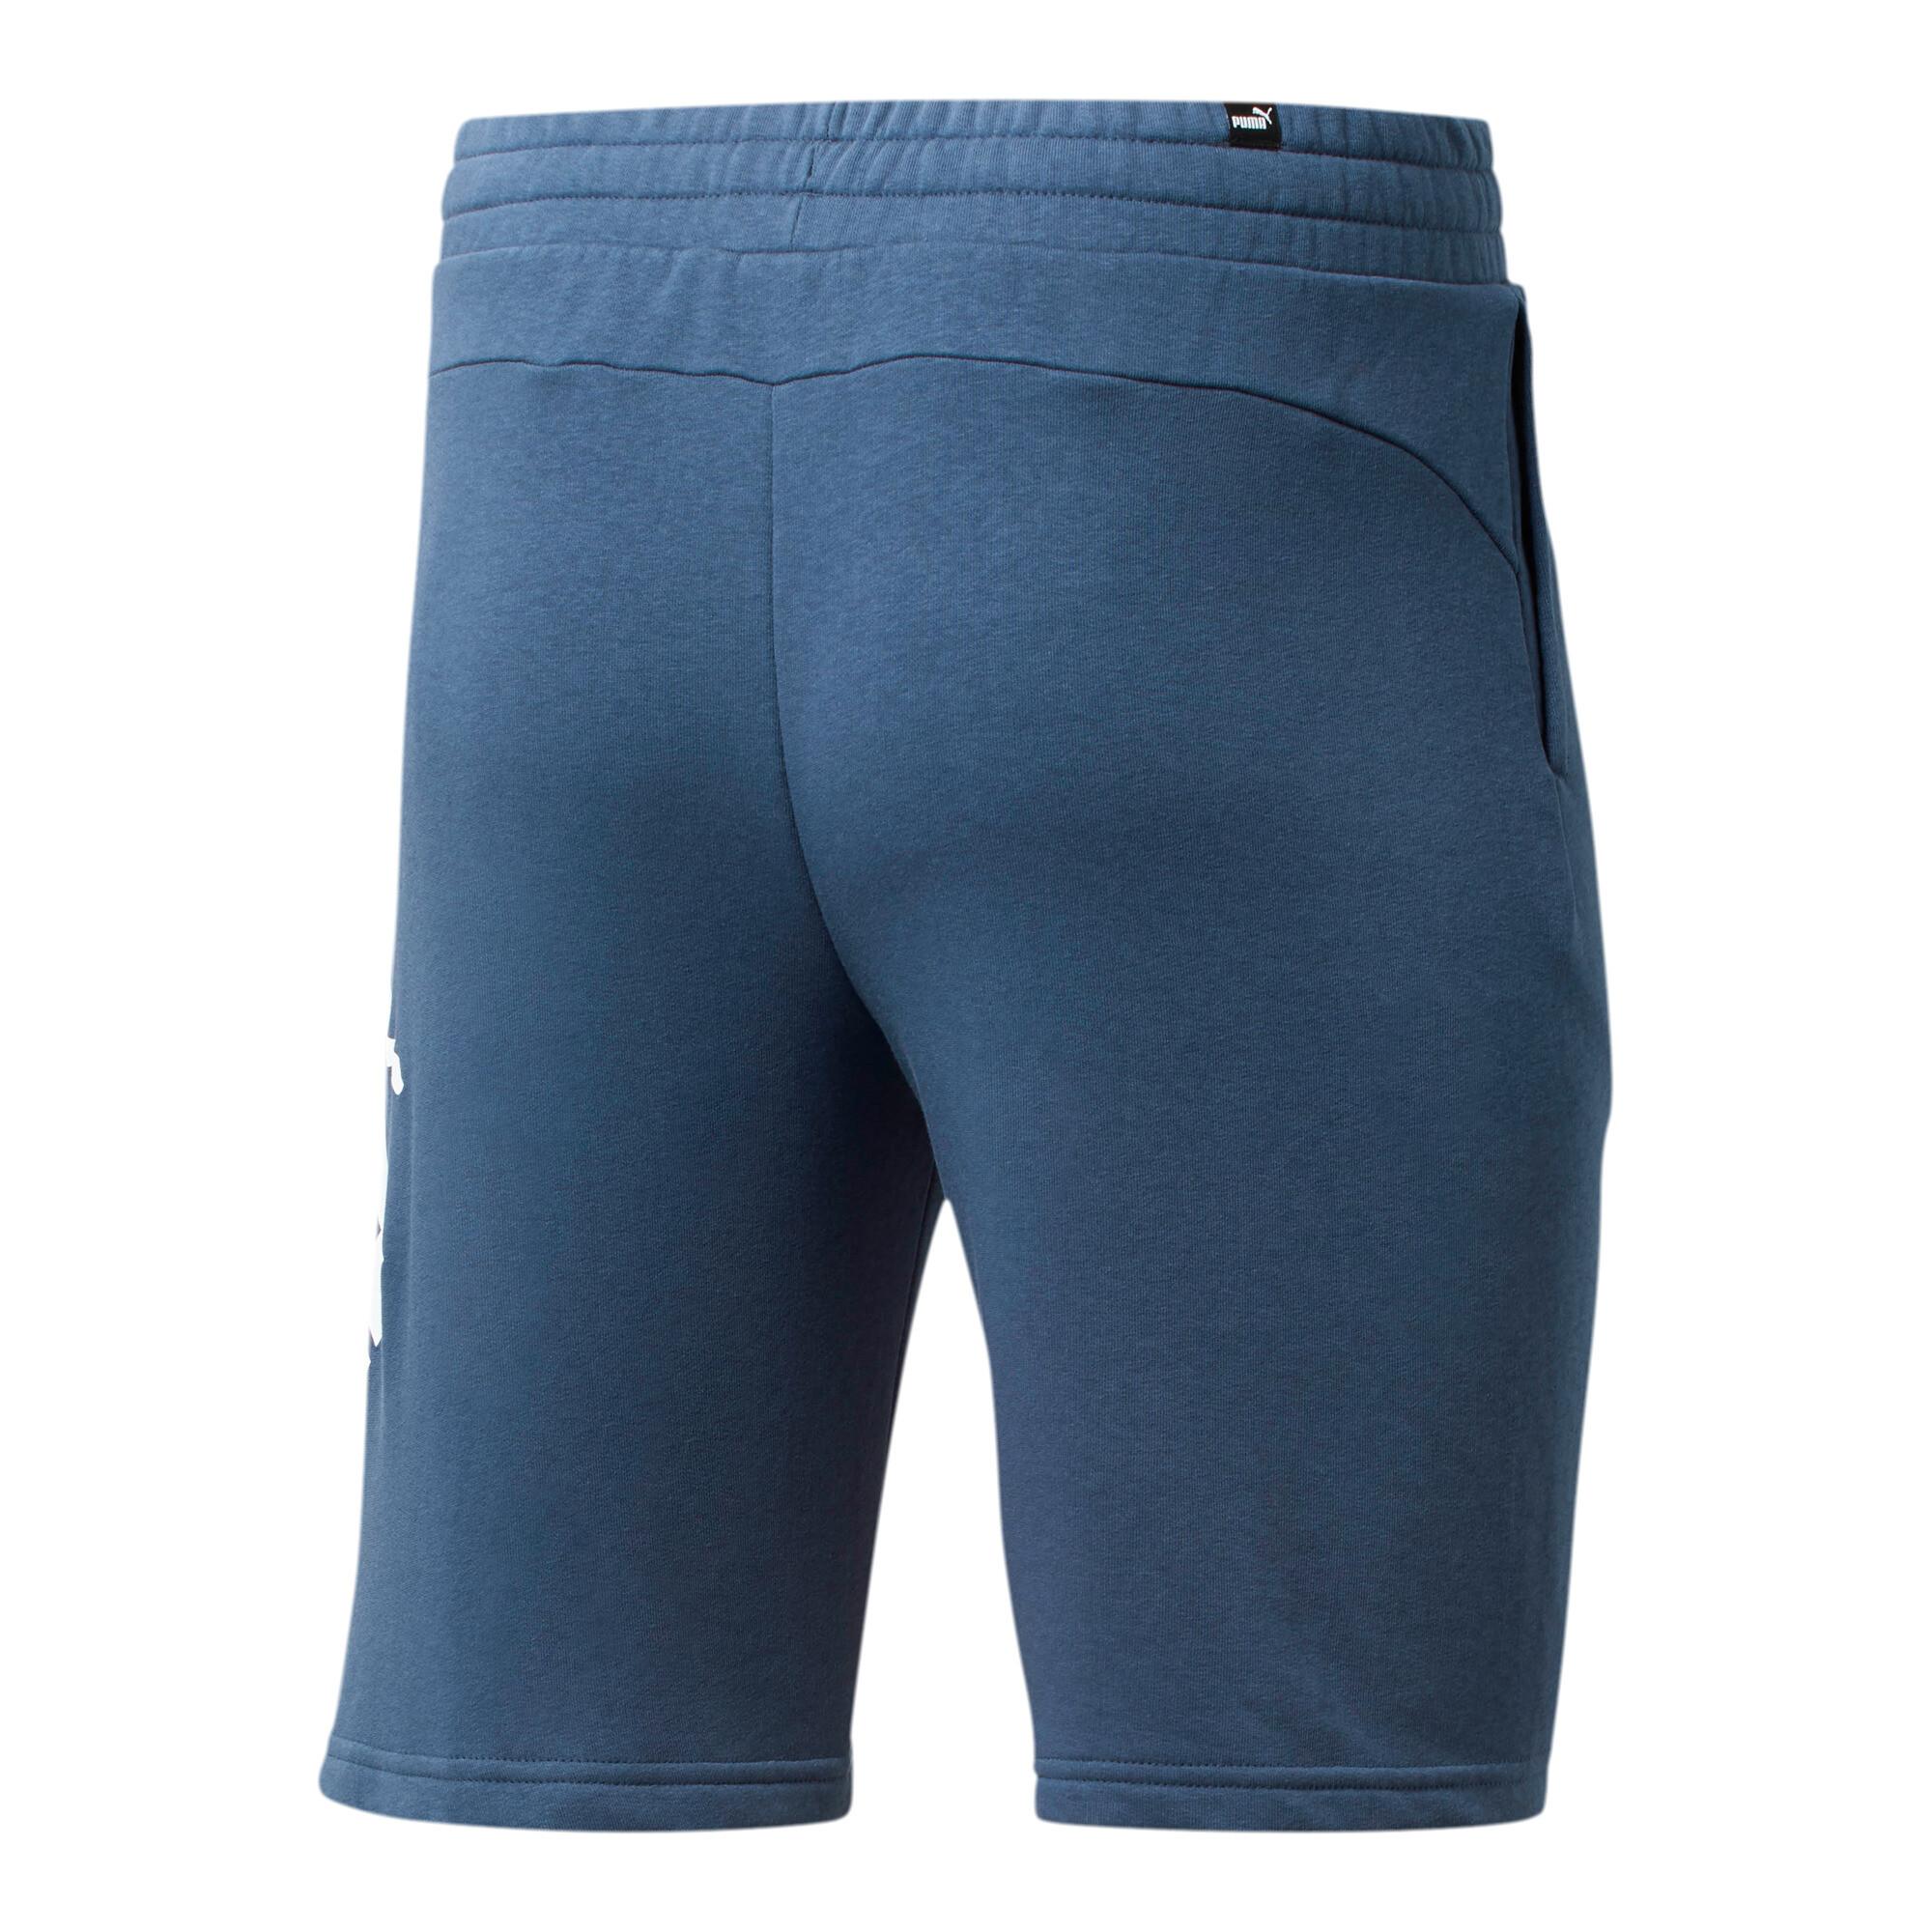 PUMA-Big-Logo-Men-039-s-Shorts-Men-Knitted-Shorts-Basics thumbnail 13